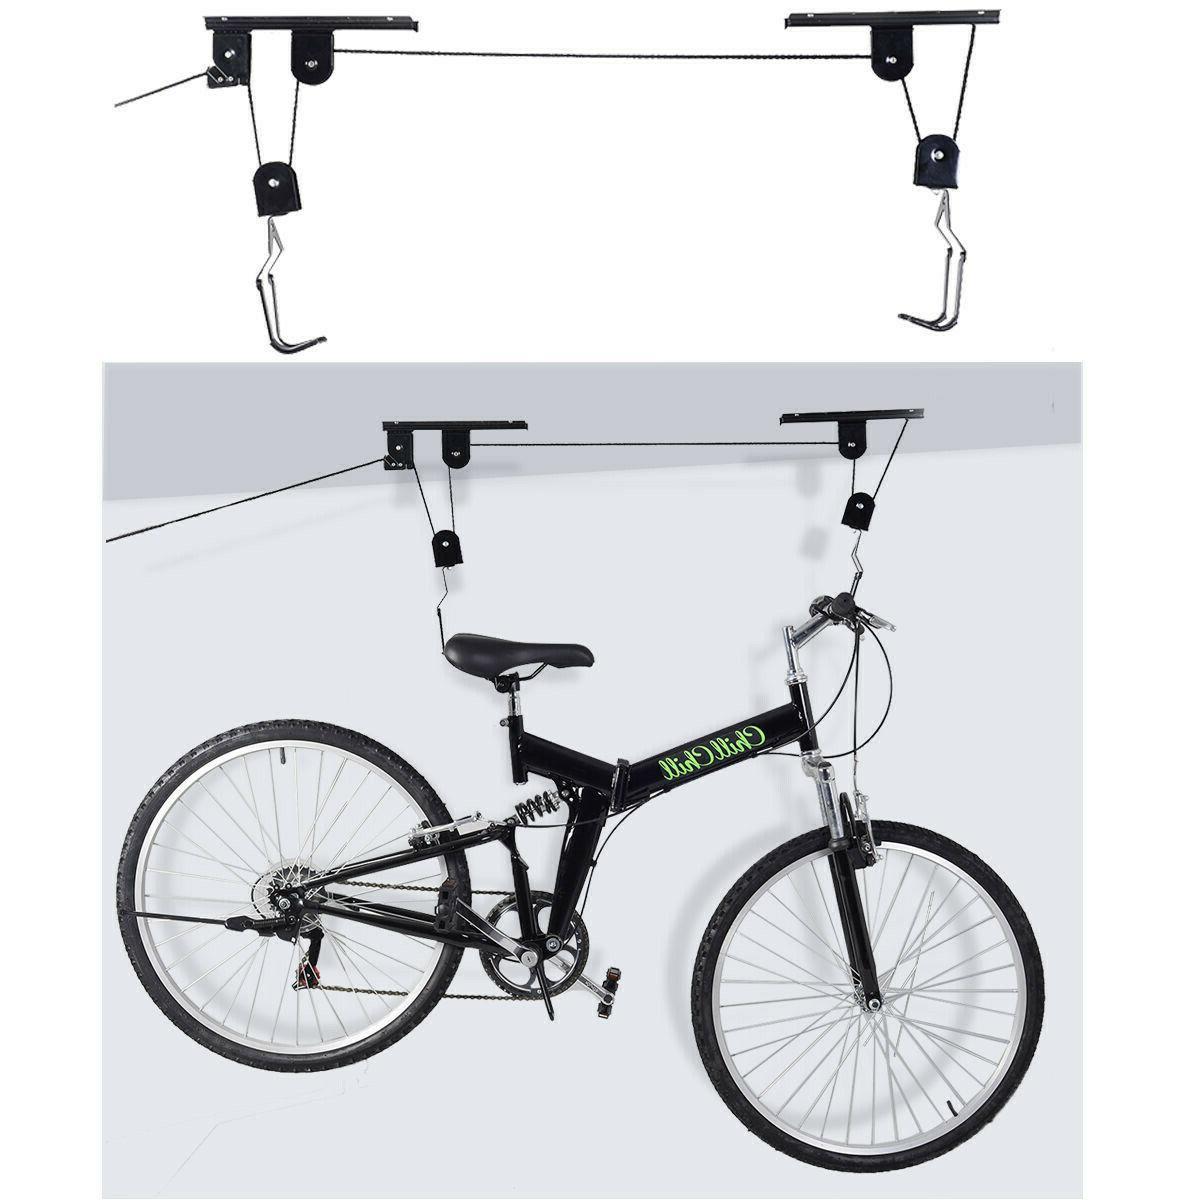 Bike Ceiling Lift Rack Hoist Sturdy Durable Construction Saf